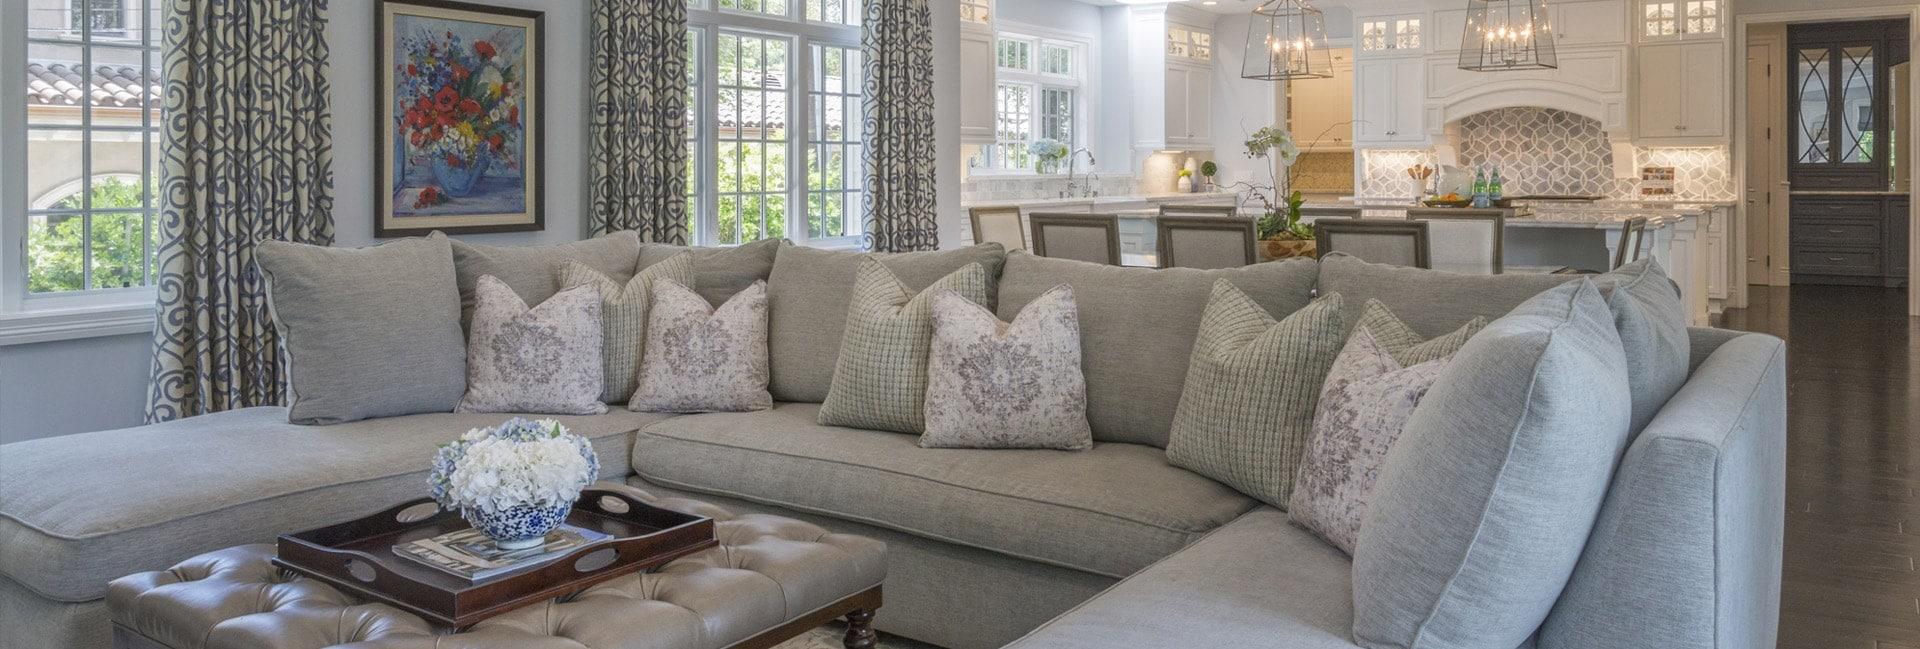 Glendale Ca Upscale Interior Design